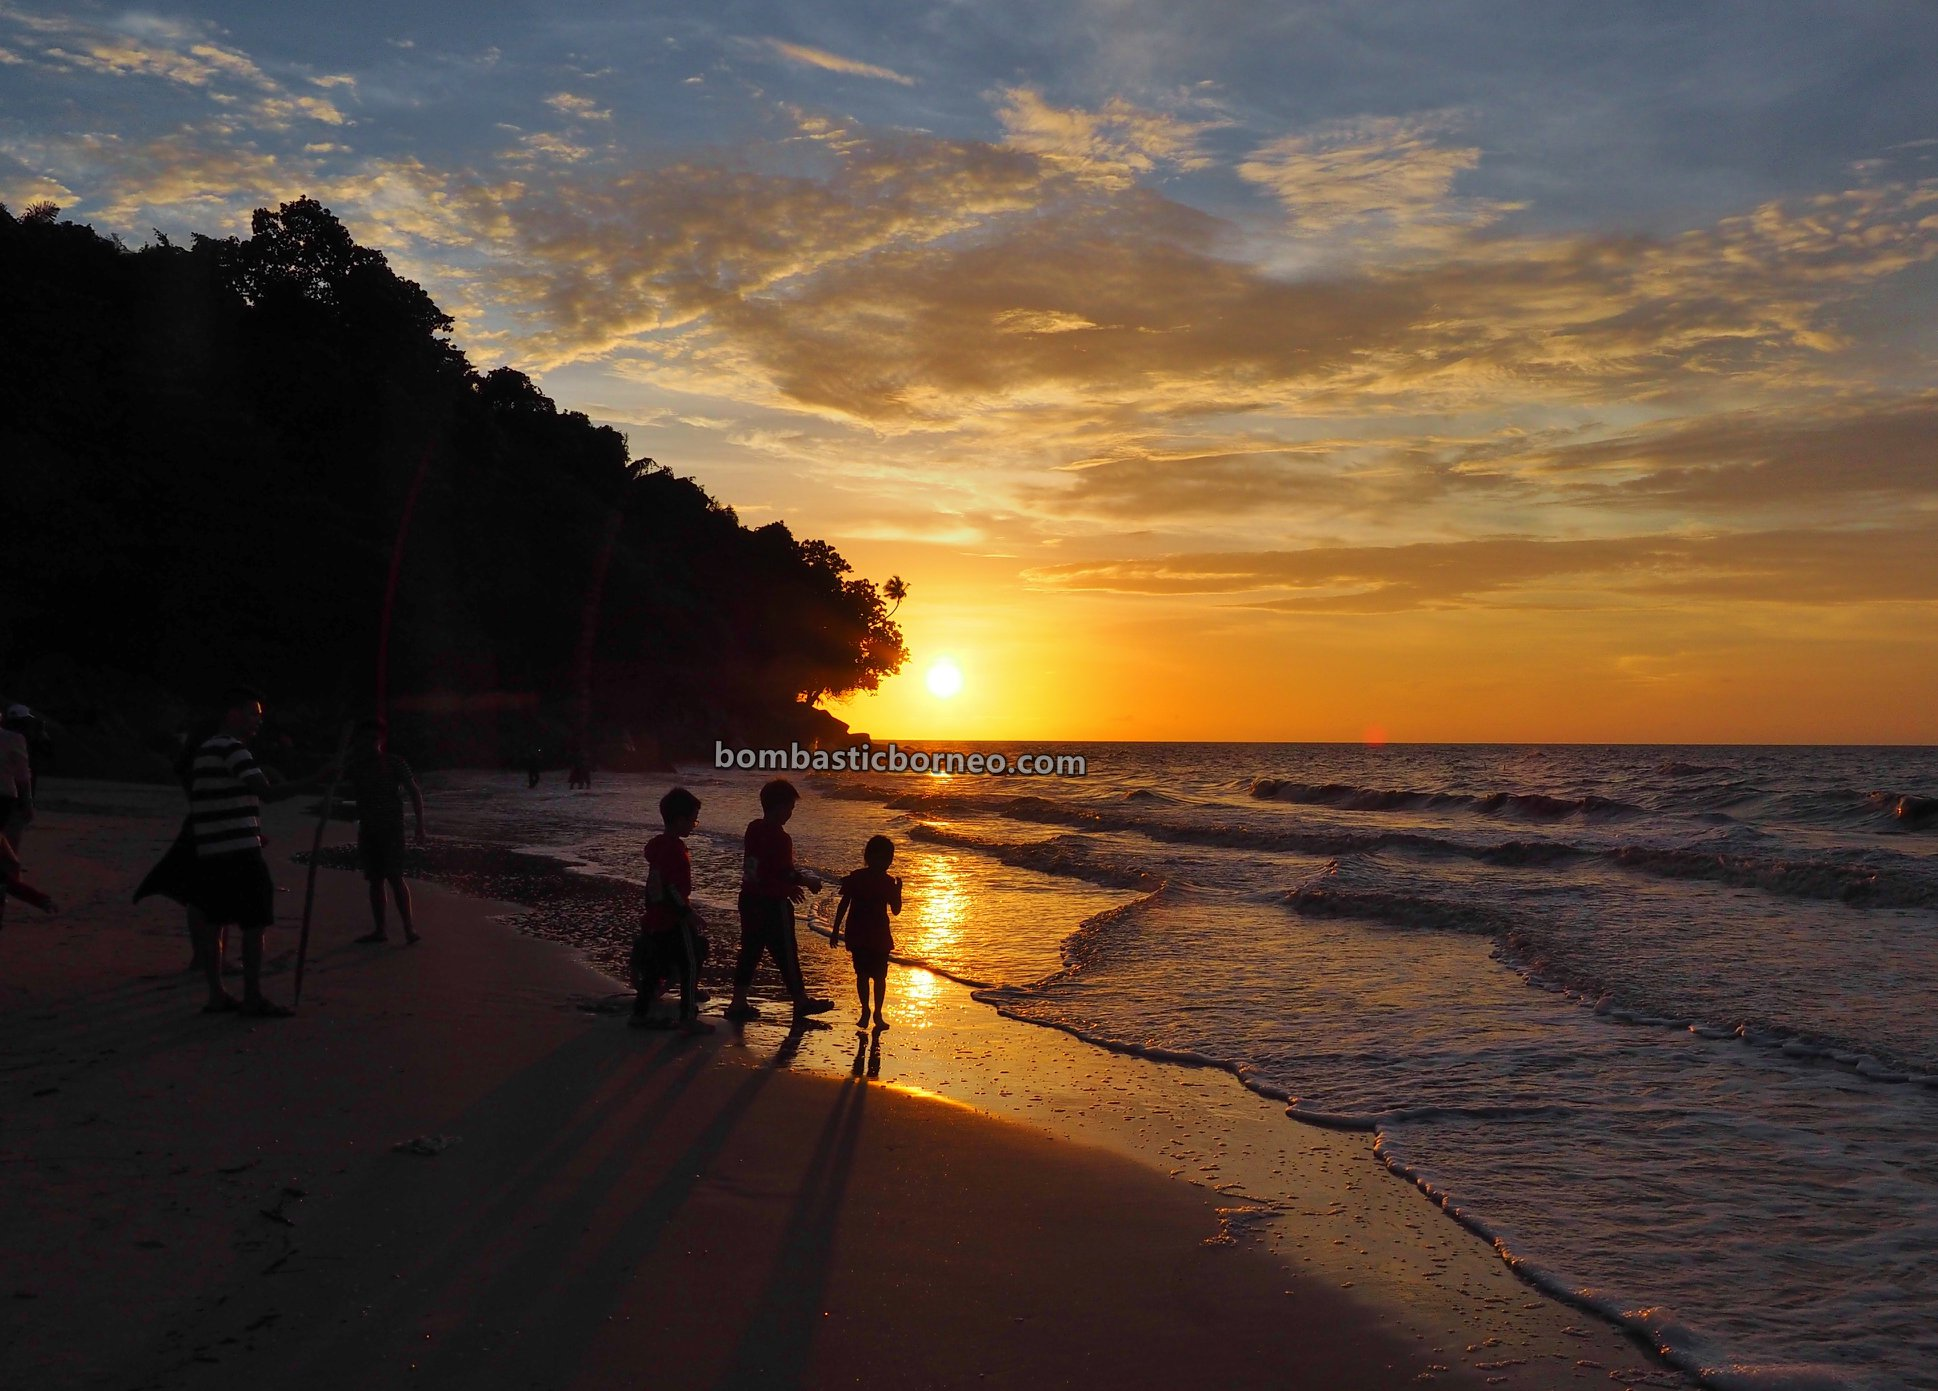 Pantai Putri Serayi, beach, adventure, nature, Malay fishing village, Kampung Nelayan Melayu, West Kalimantan, Obyek wisata, Tourism, travel guide, backpackers, Trans Borneo, 穿越婆罗洲游踪, 印尼西加里曼丹, 三发马来渔村